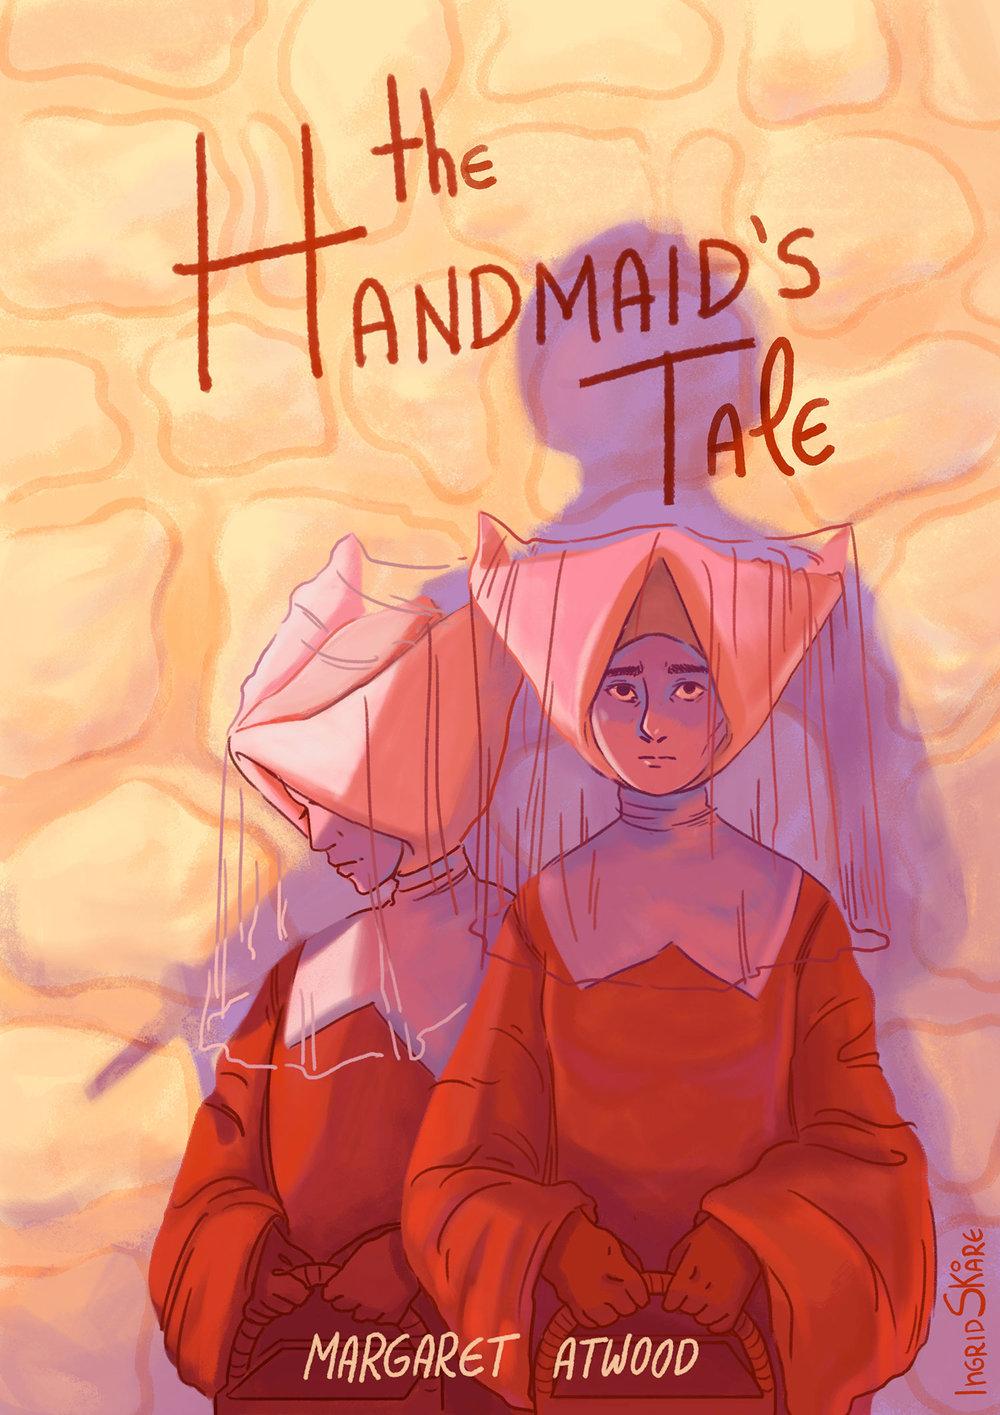 handmaids_cover_IngridSkare.jpg